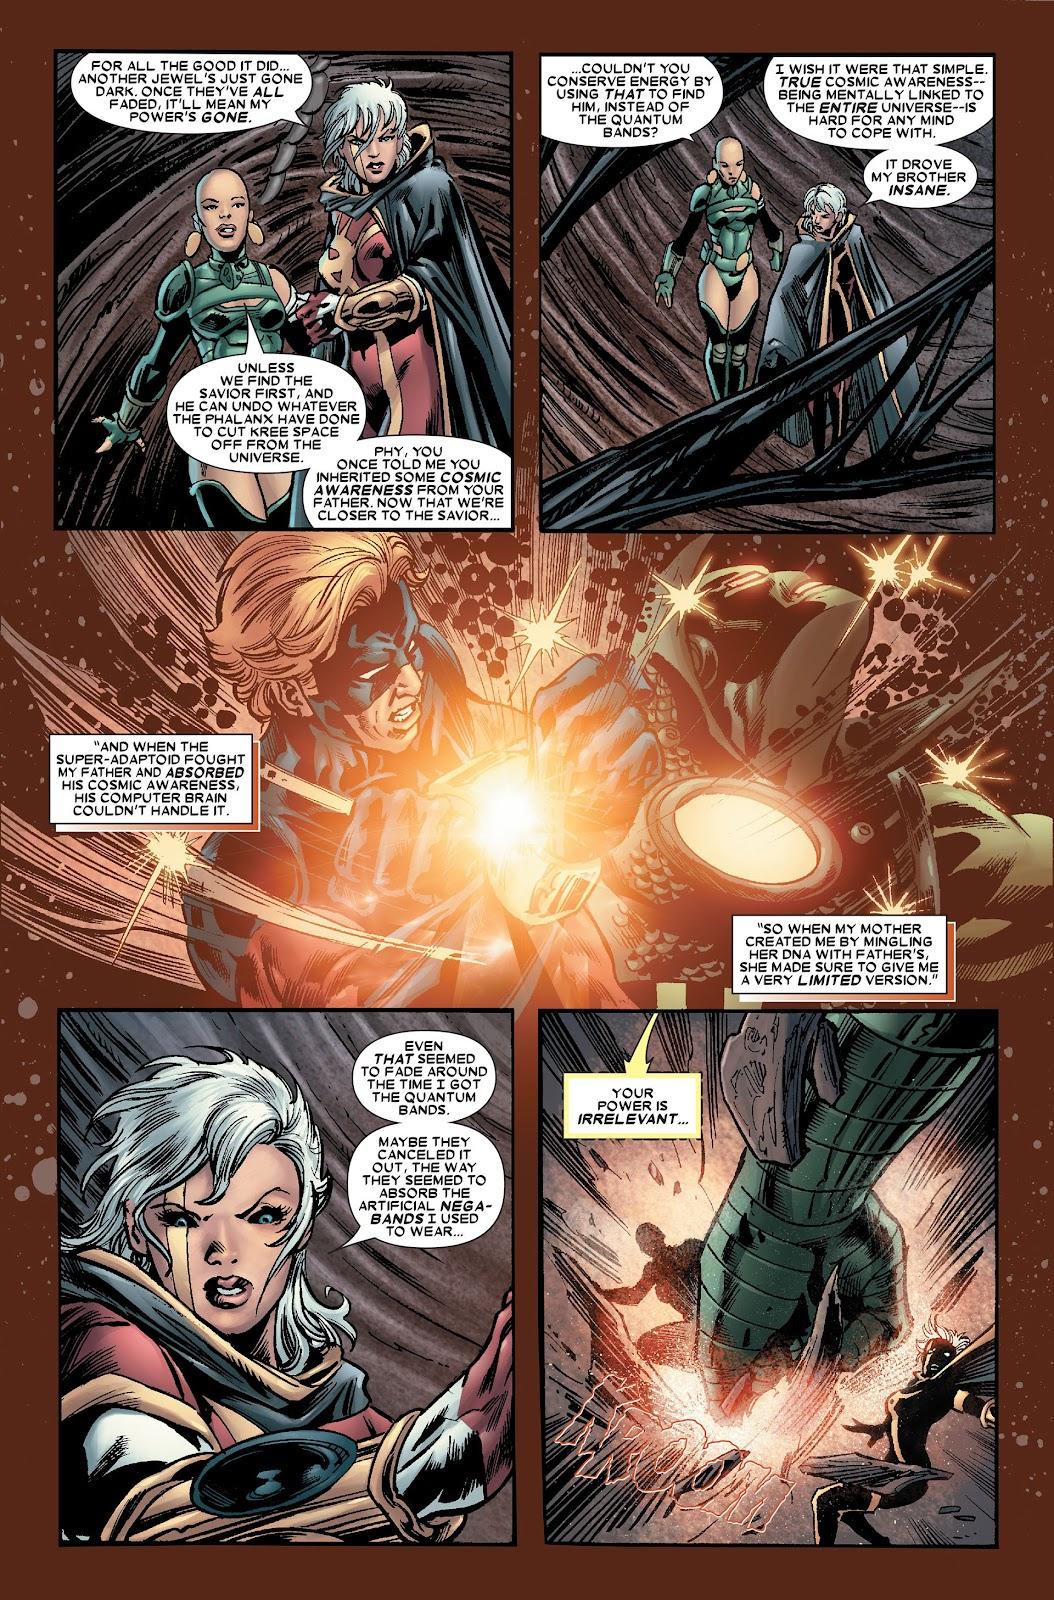 Annihilation: Conquest - Quasar issue 2 - Page 16